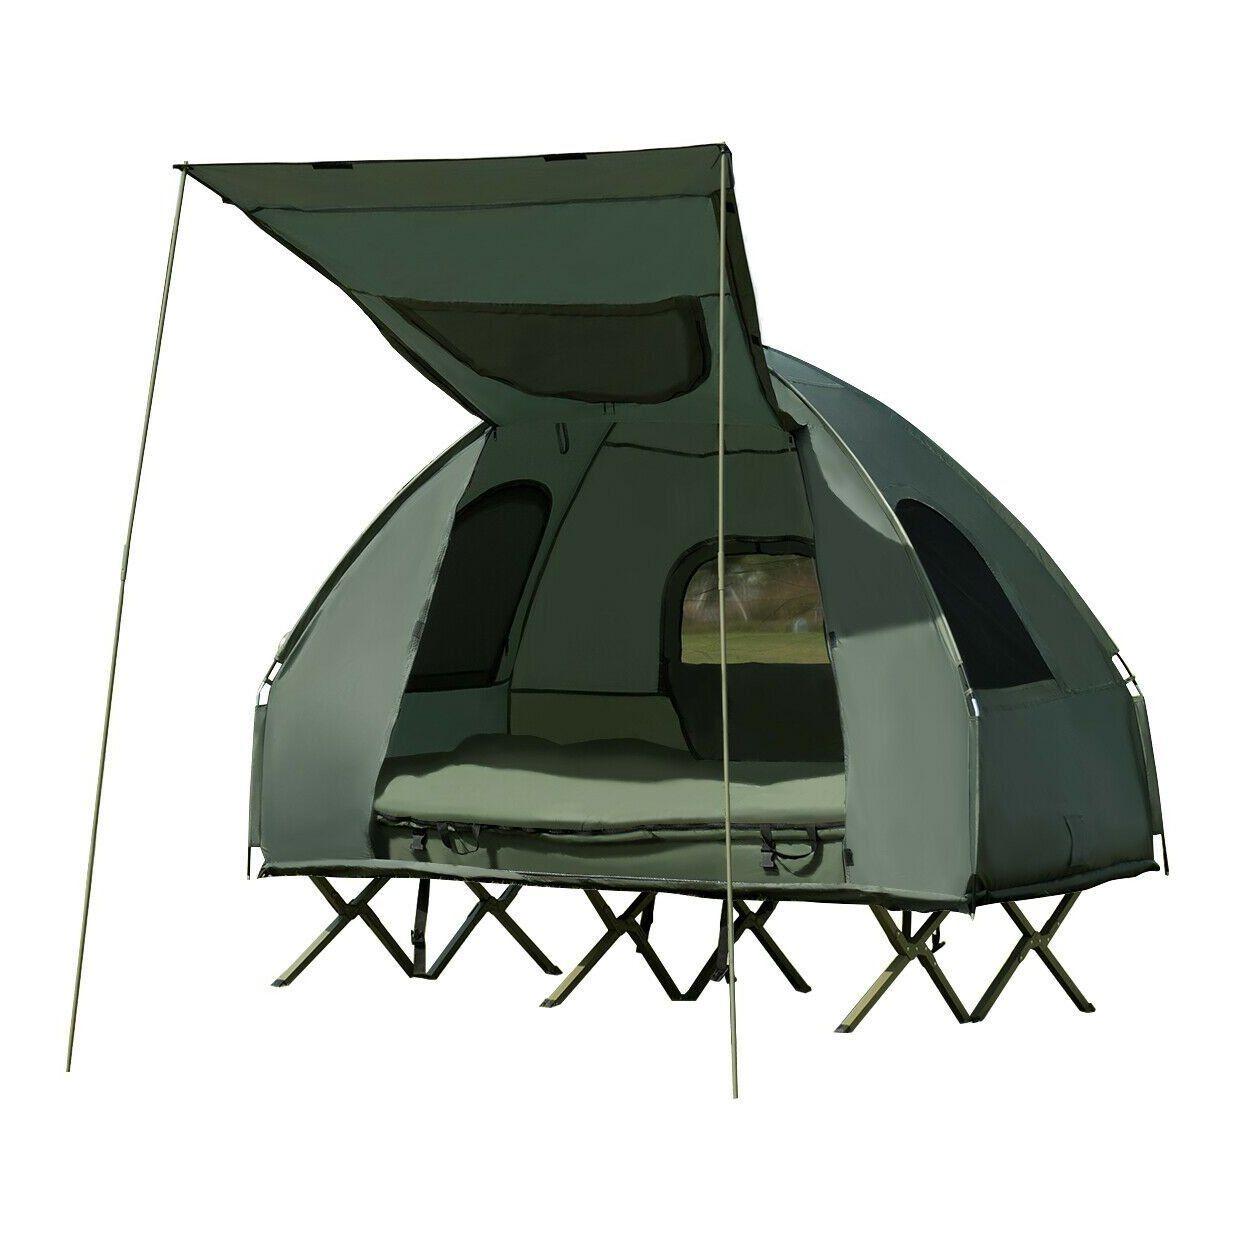 Gymax 2 Person Compact Portable Pop Up Tent Camping Cot W Air Mattress Sleeping Bag Walmart Com Tent Camping Beds Air Mattr In 2020 Tent Cot Camping Cot Tent